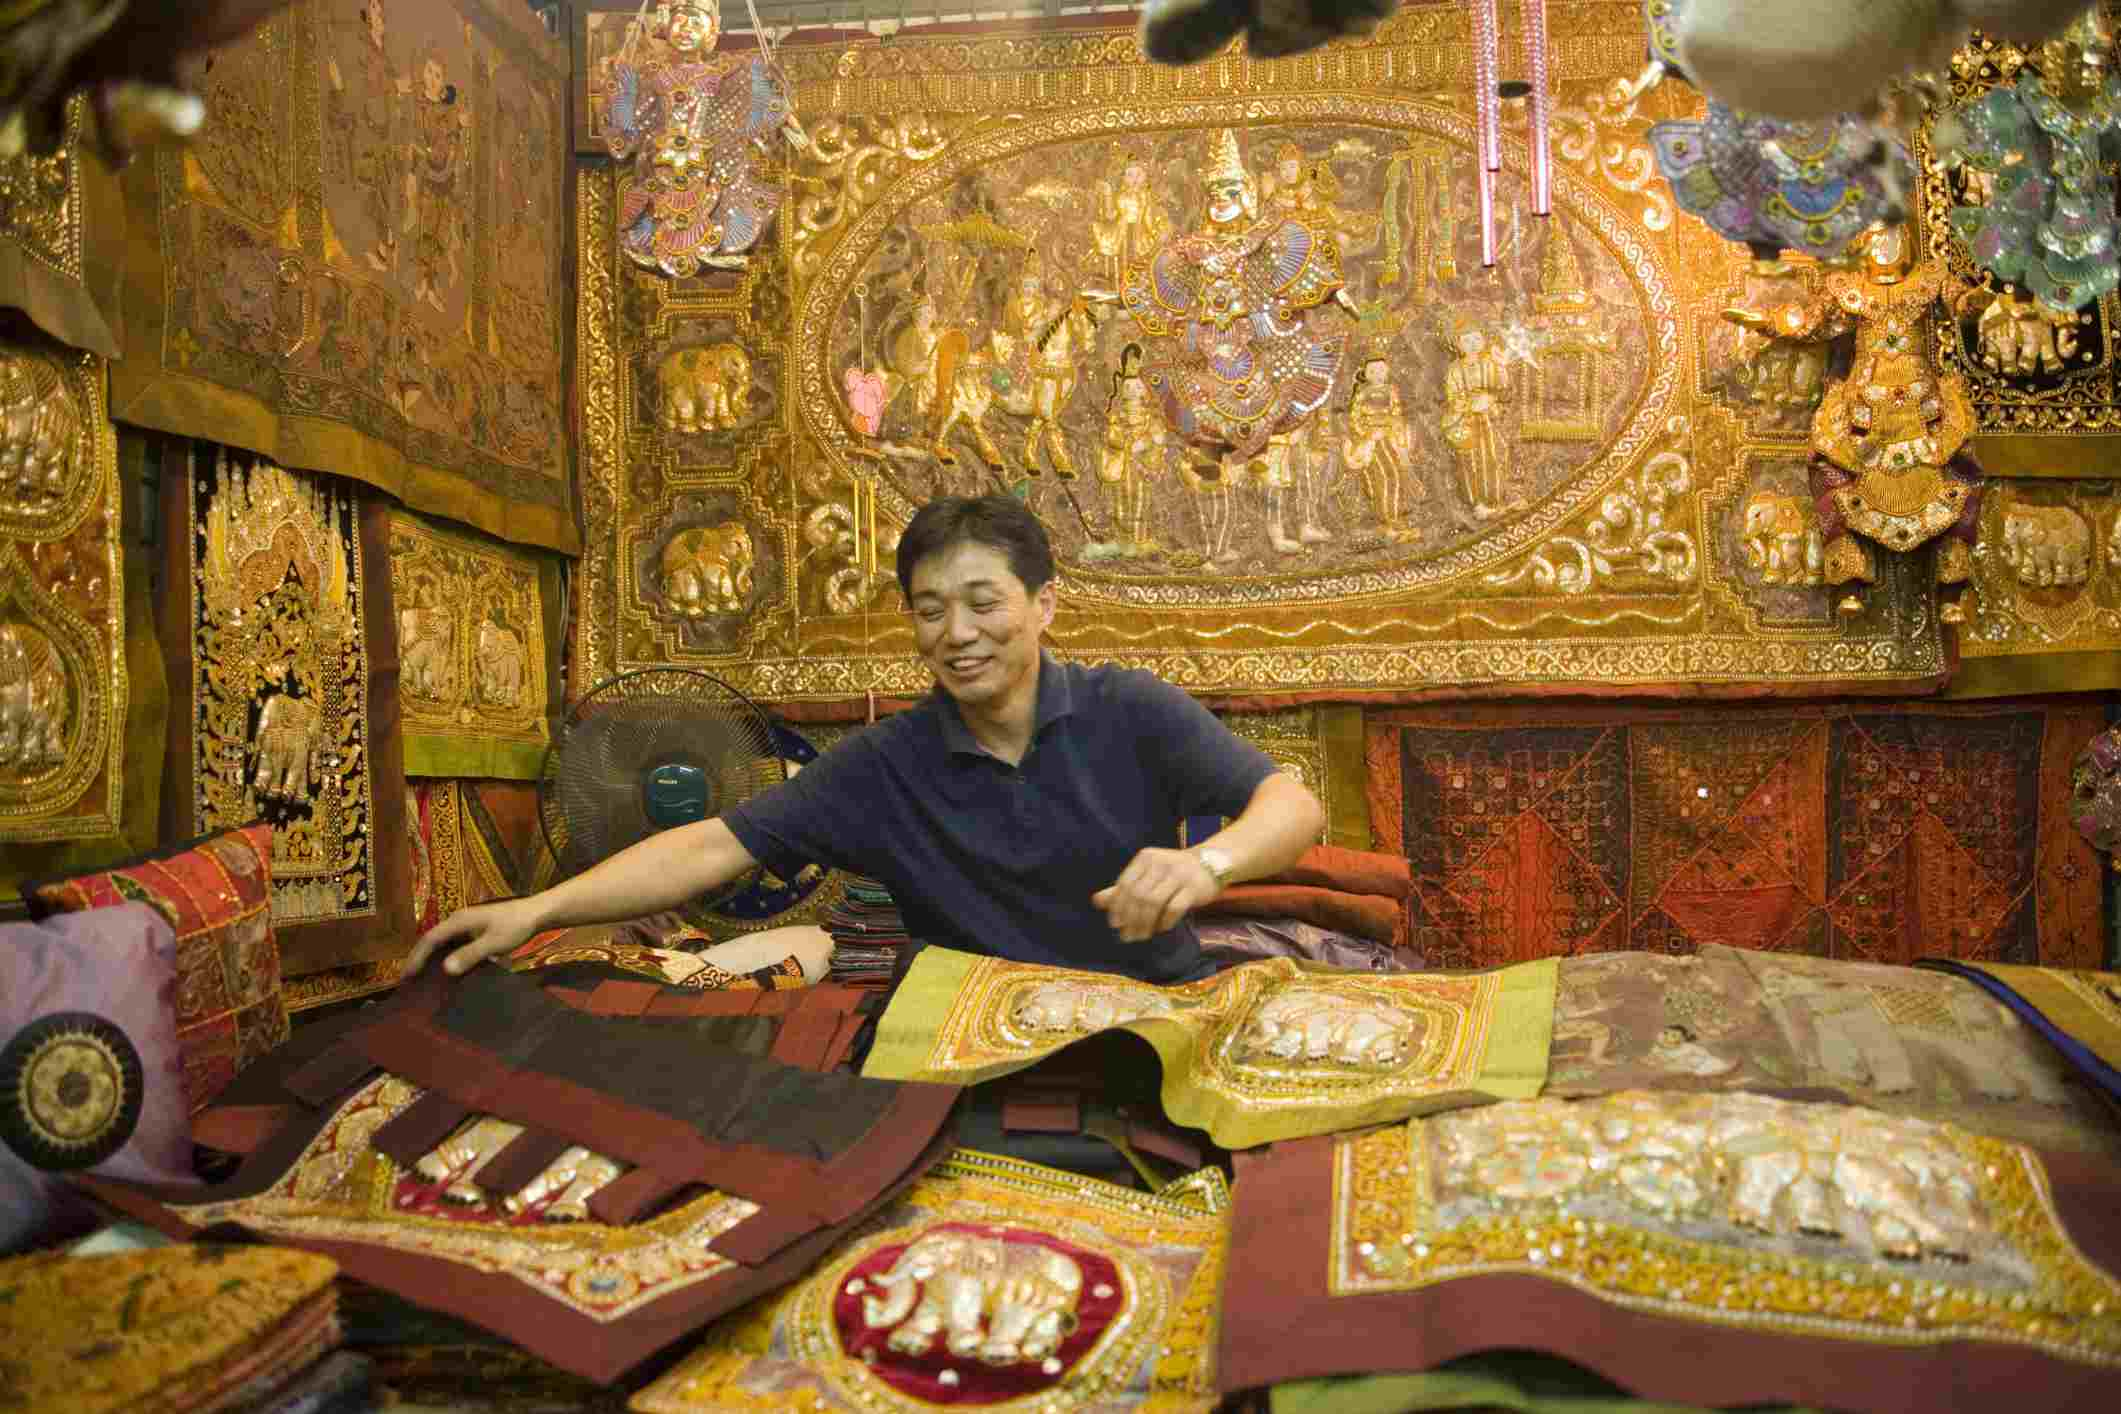 A merchant showing his goods, Suan Chatuchak Weekend Market, Bangkok, Thailand